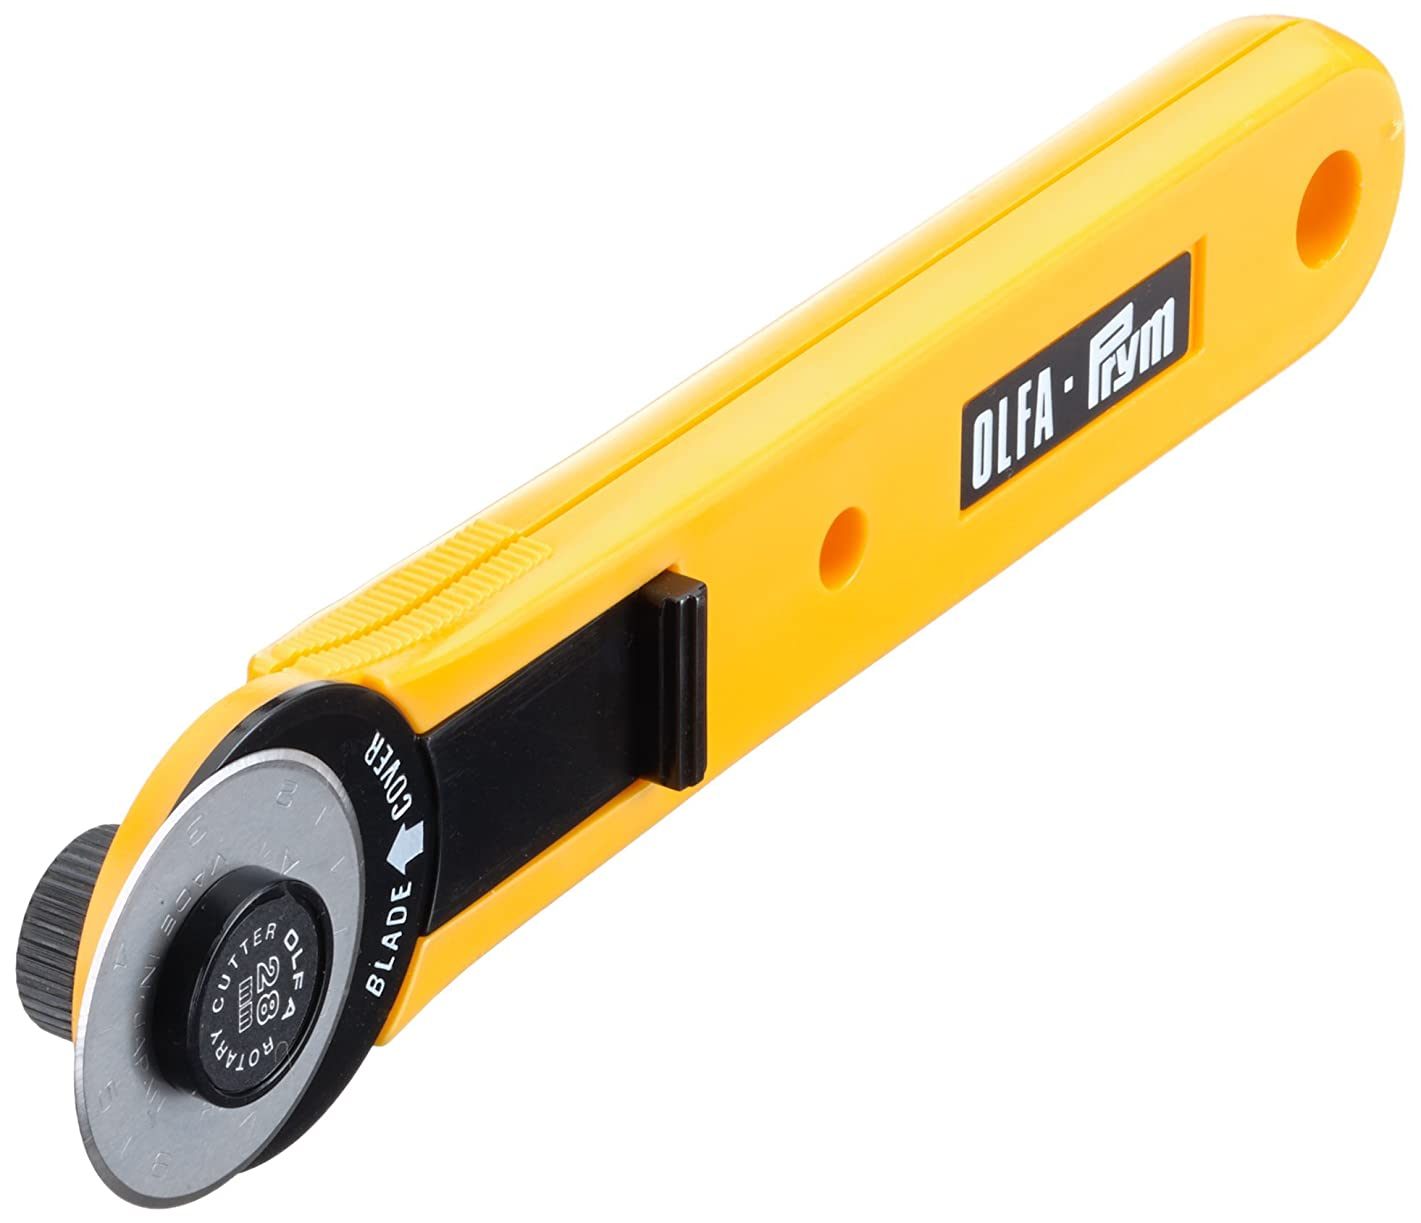 PRYM/OLFA 611371 Rotary cutter MINI Size 28mm, 1 piece